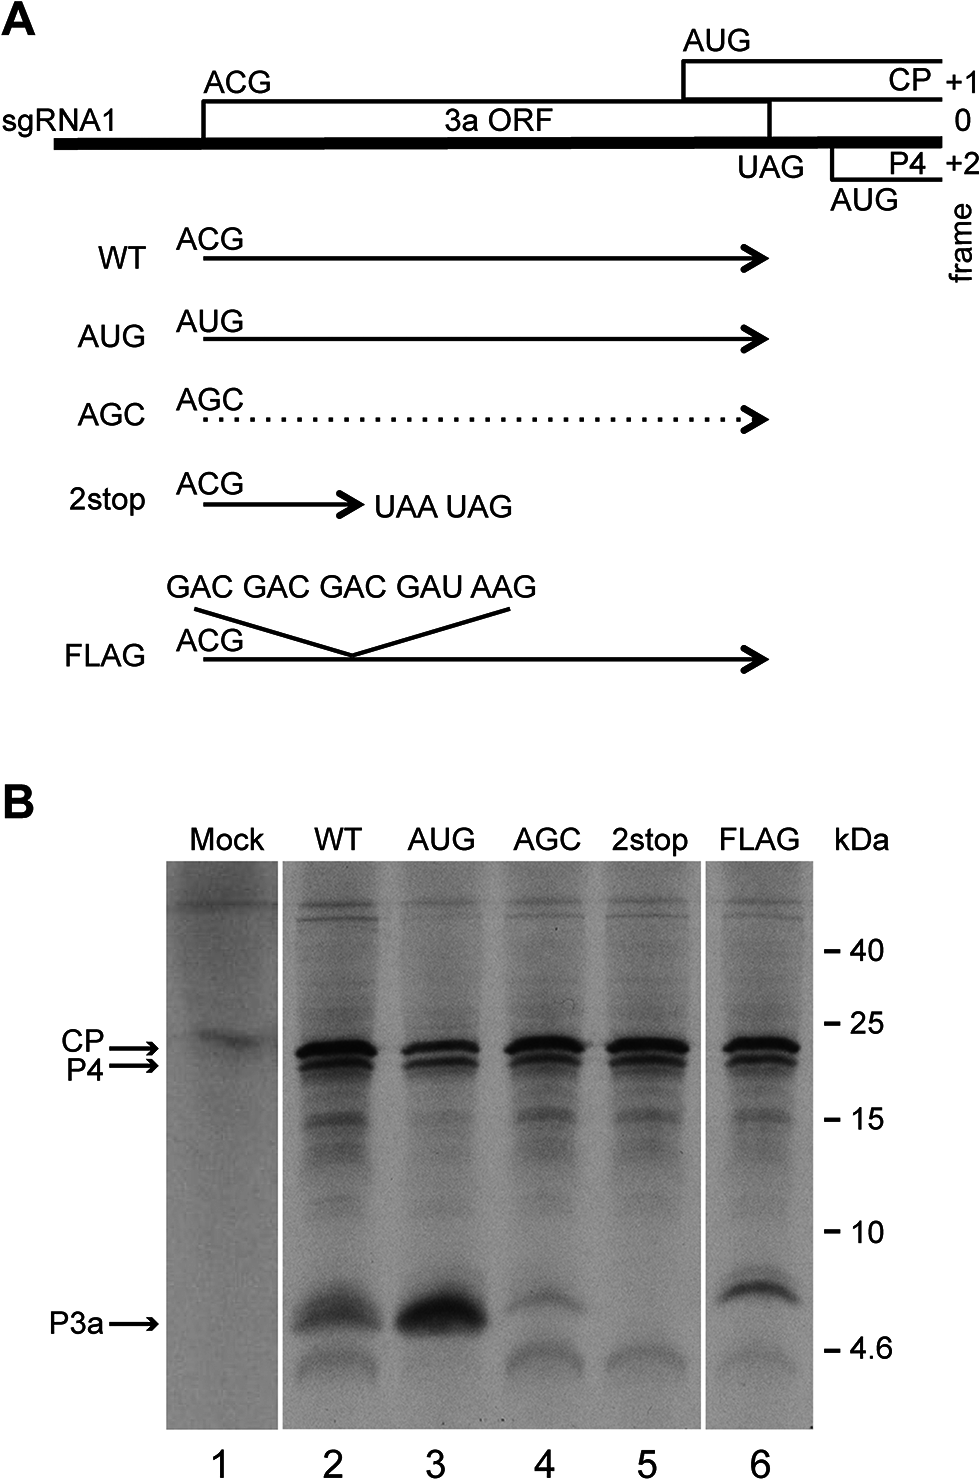 Schematic representation of the TuYV-3a mutants and <i>in vitro</i> translation of their corresponding subgenomic RNA1.